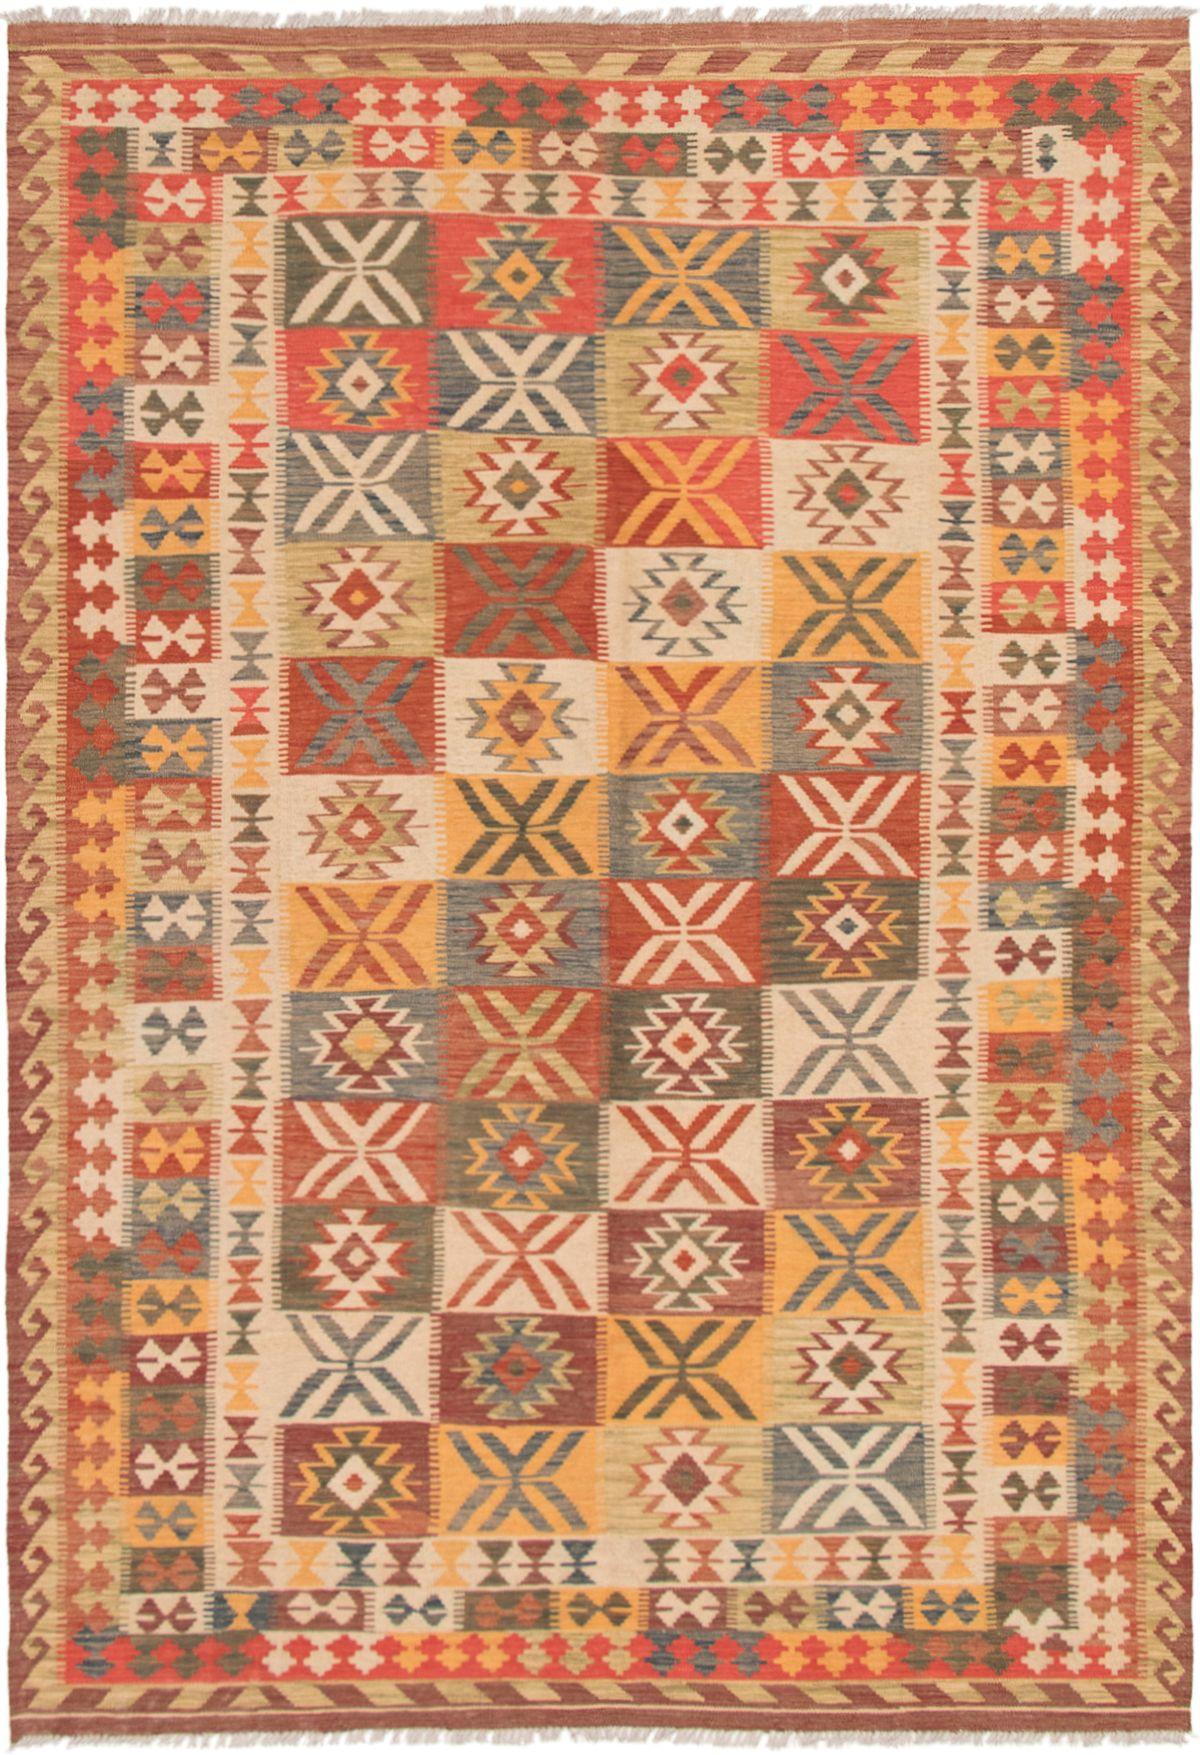 "Hand woven Istanbul Yama FW Dark Red, Light Orange Wool Kilim 6'9"" x 9'10"" Size: 6'9"" x 9'10"""